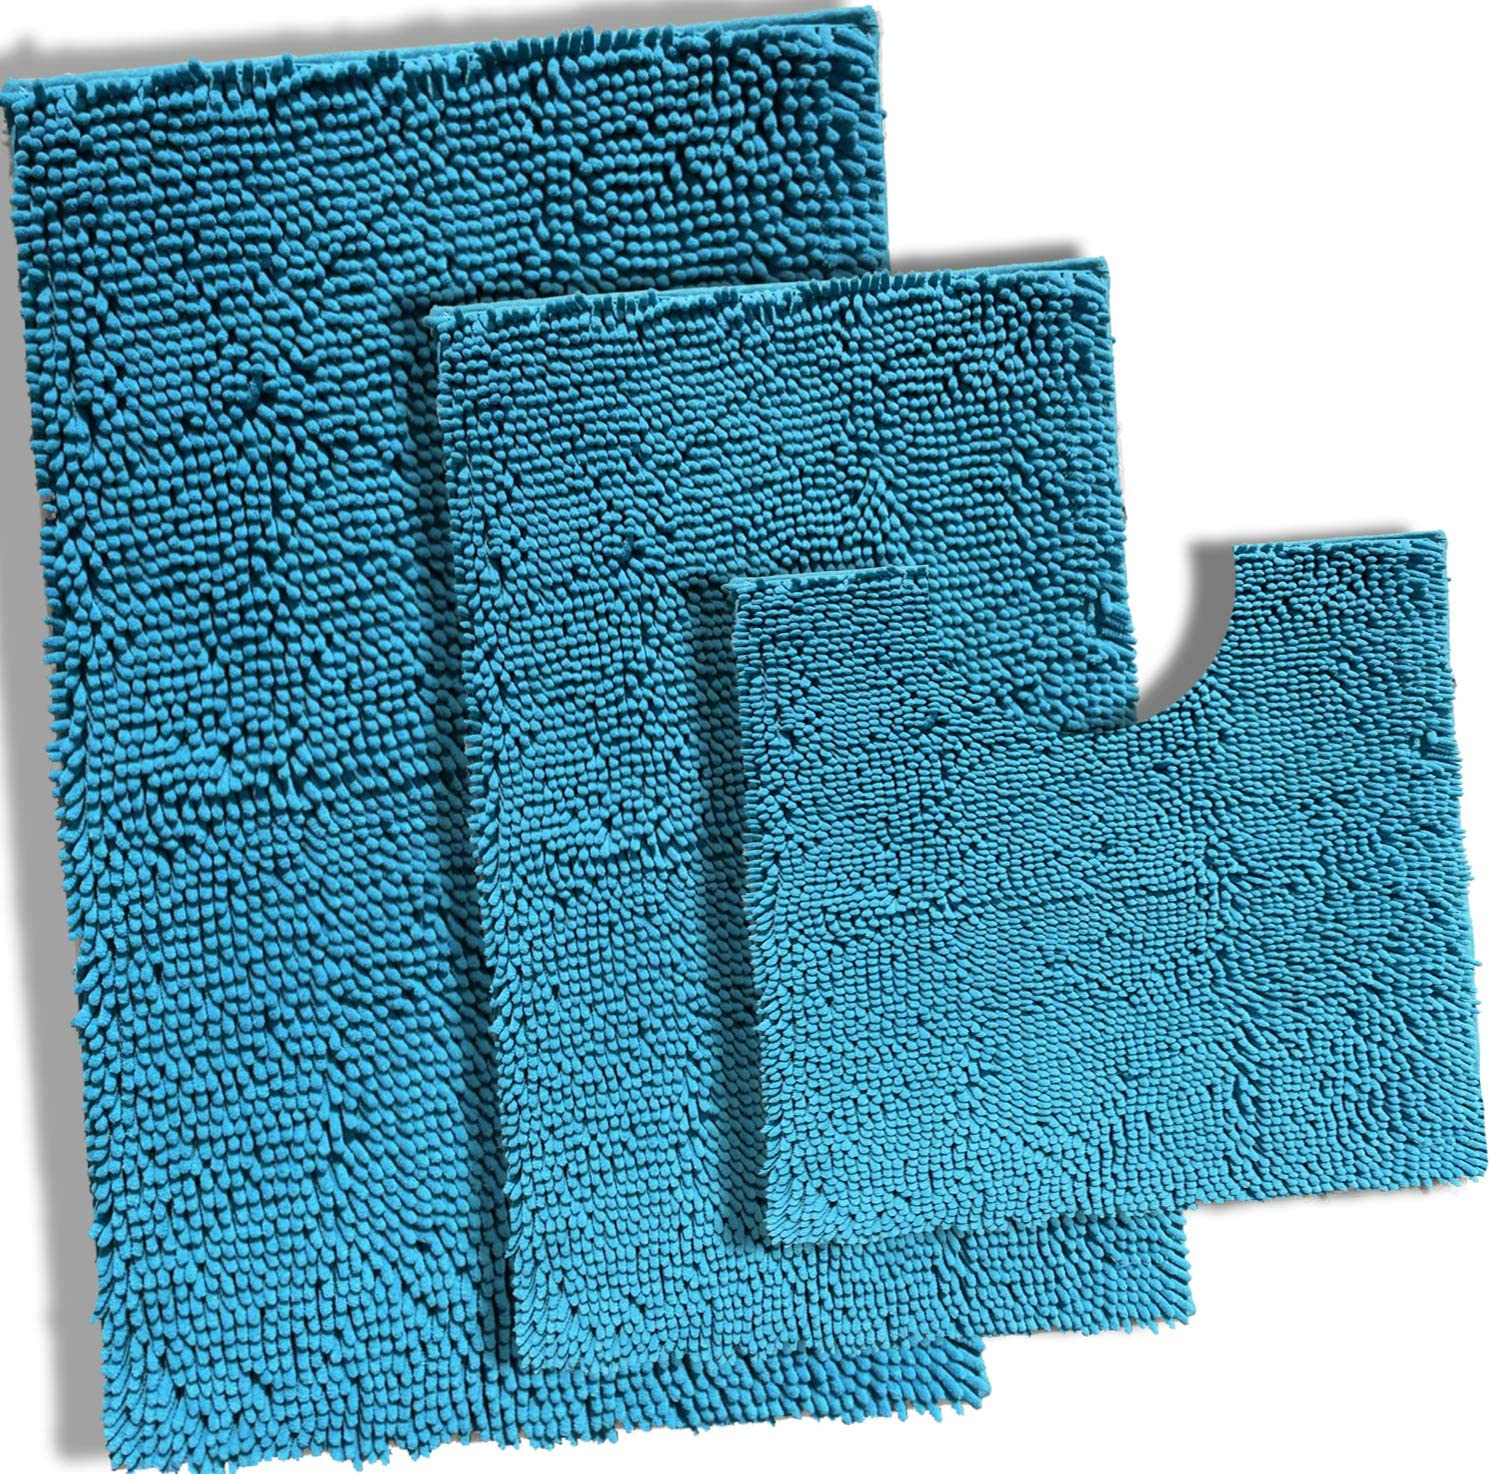 Teal Blue Detroit Mall Bathroom Brand new Rugs Set 3 Extra Chenille Bath Mat Sof Piece